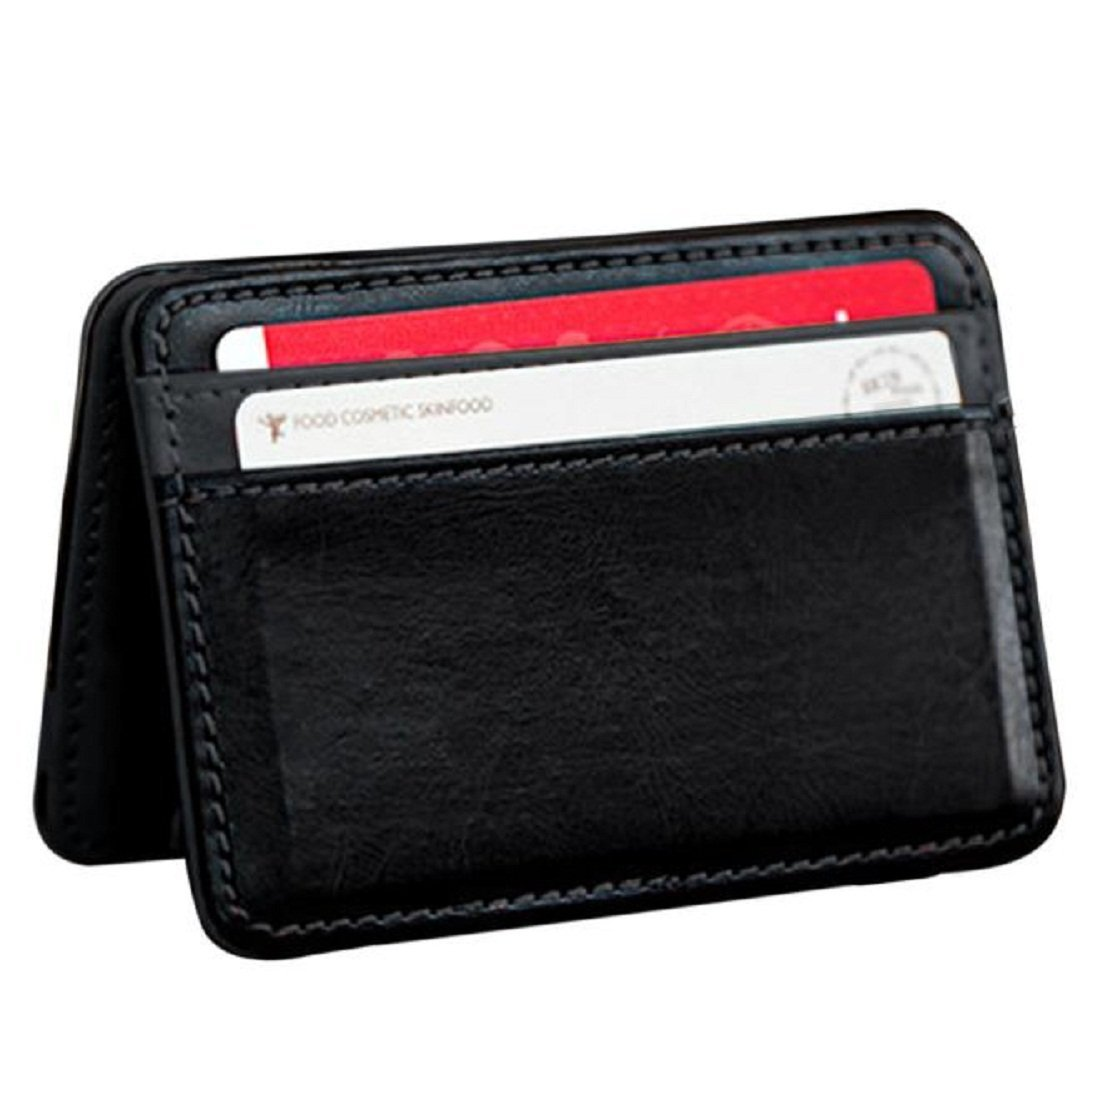 Wallet,toraway Luxury Mini Neutral Magic Bifold Leather Wallet Card Holder Wallet Purse (Black)